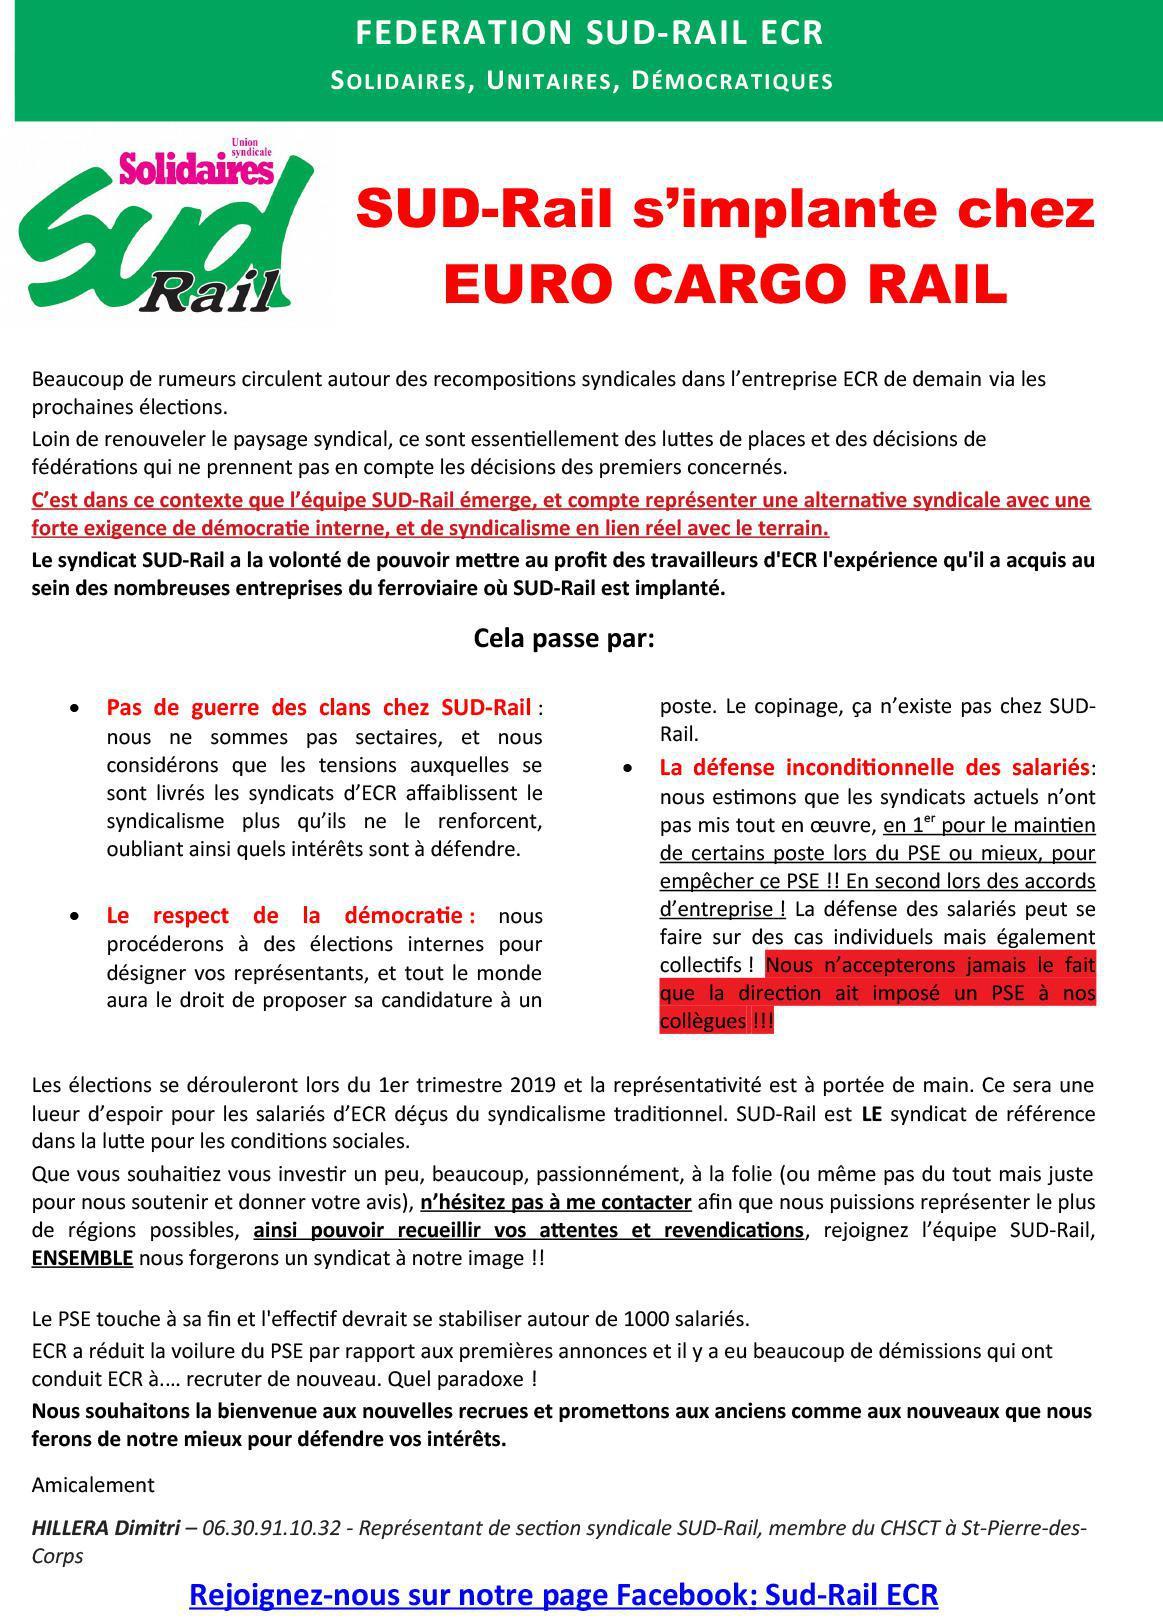 SUD-RAIL S'IMPLANTE CHEZ EURO CARGO RAIL !